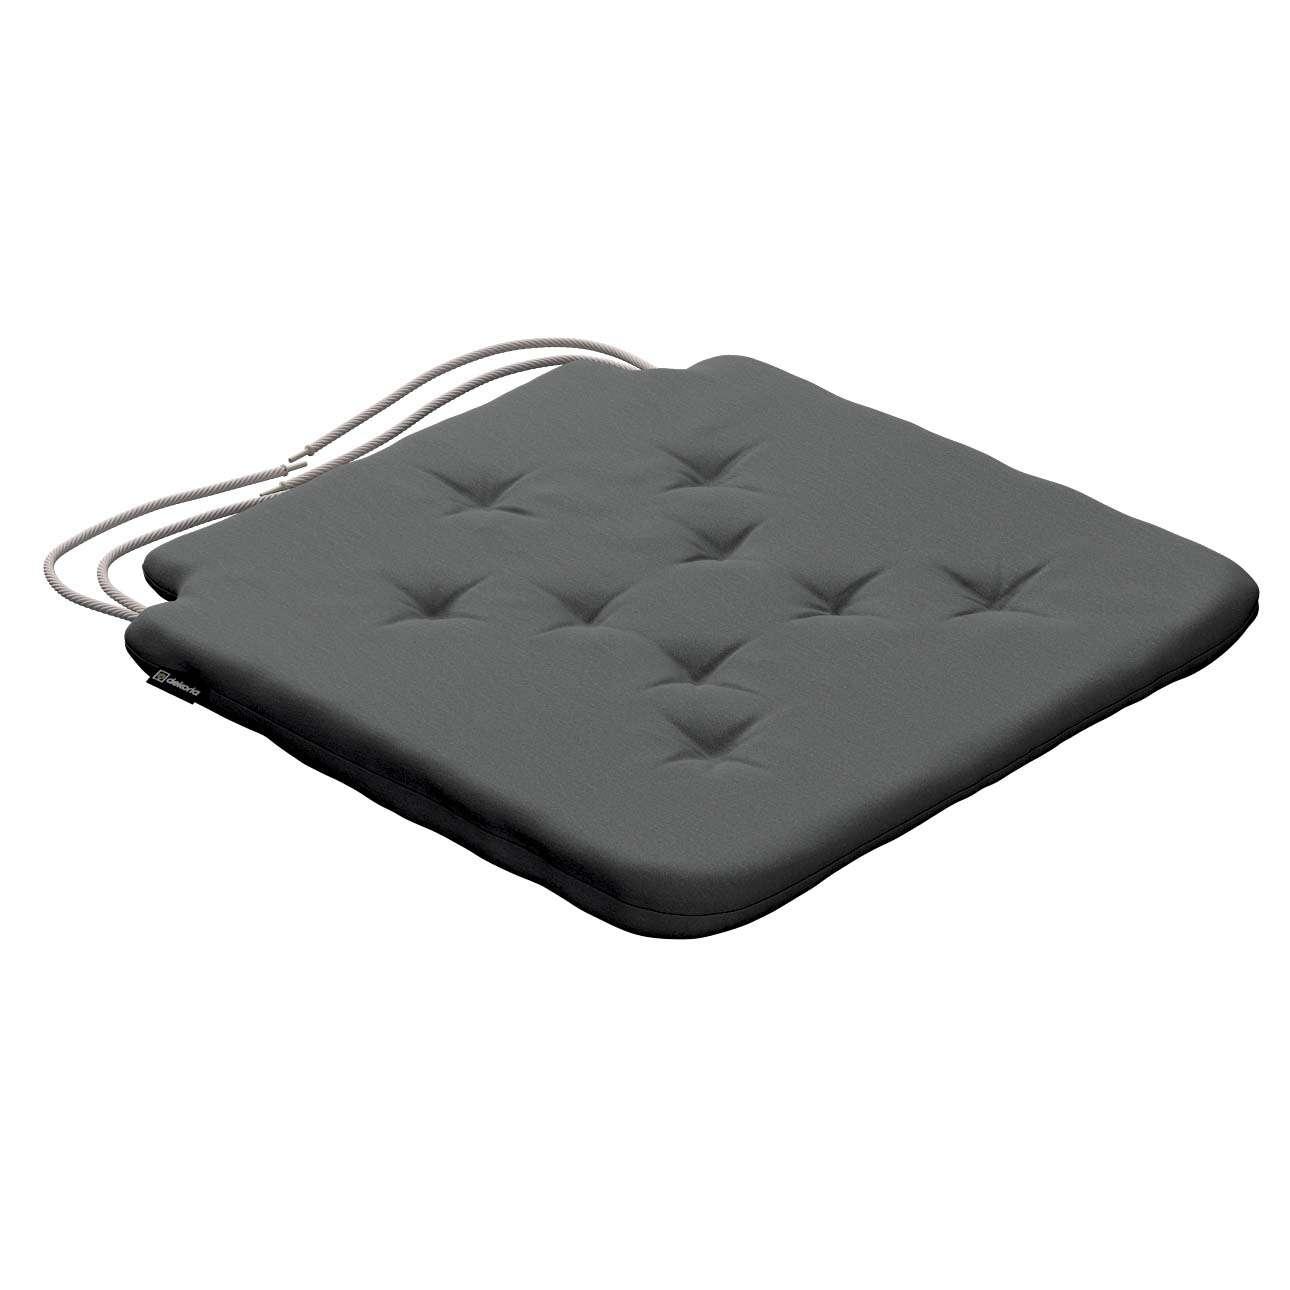 Kėdės pagalvėlė Olek  42 x 41 x 3,5 cm kolekcijoje Quadro, audinys: 136-14